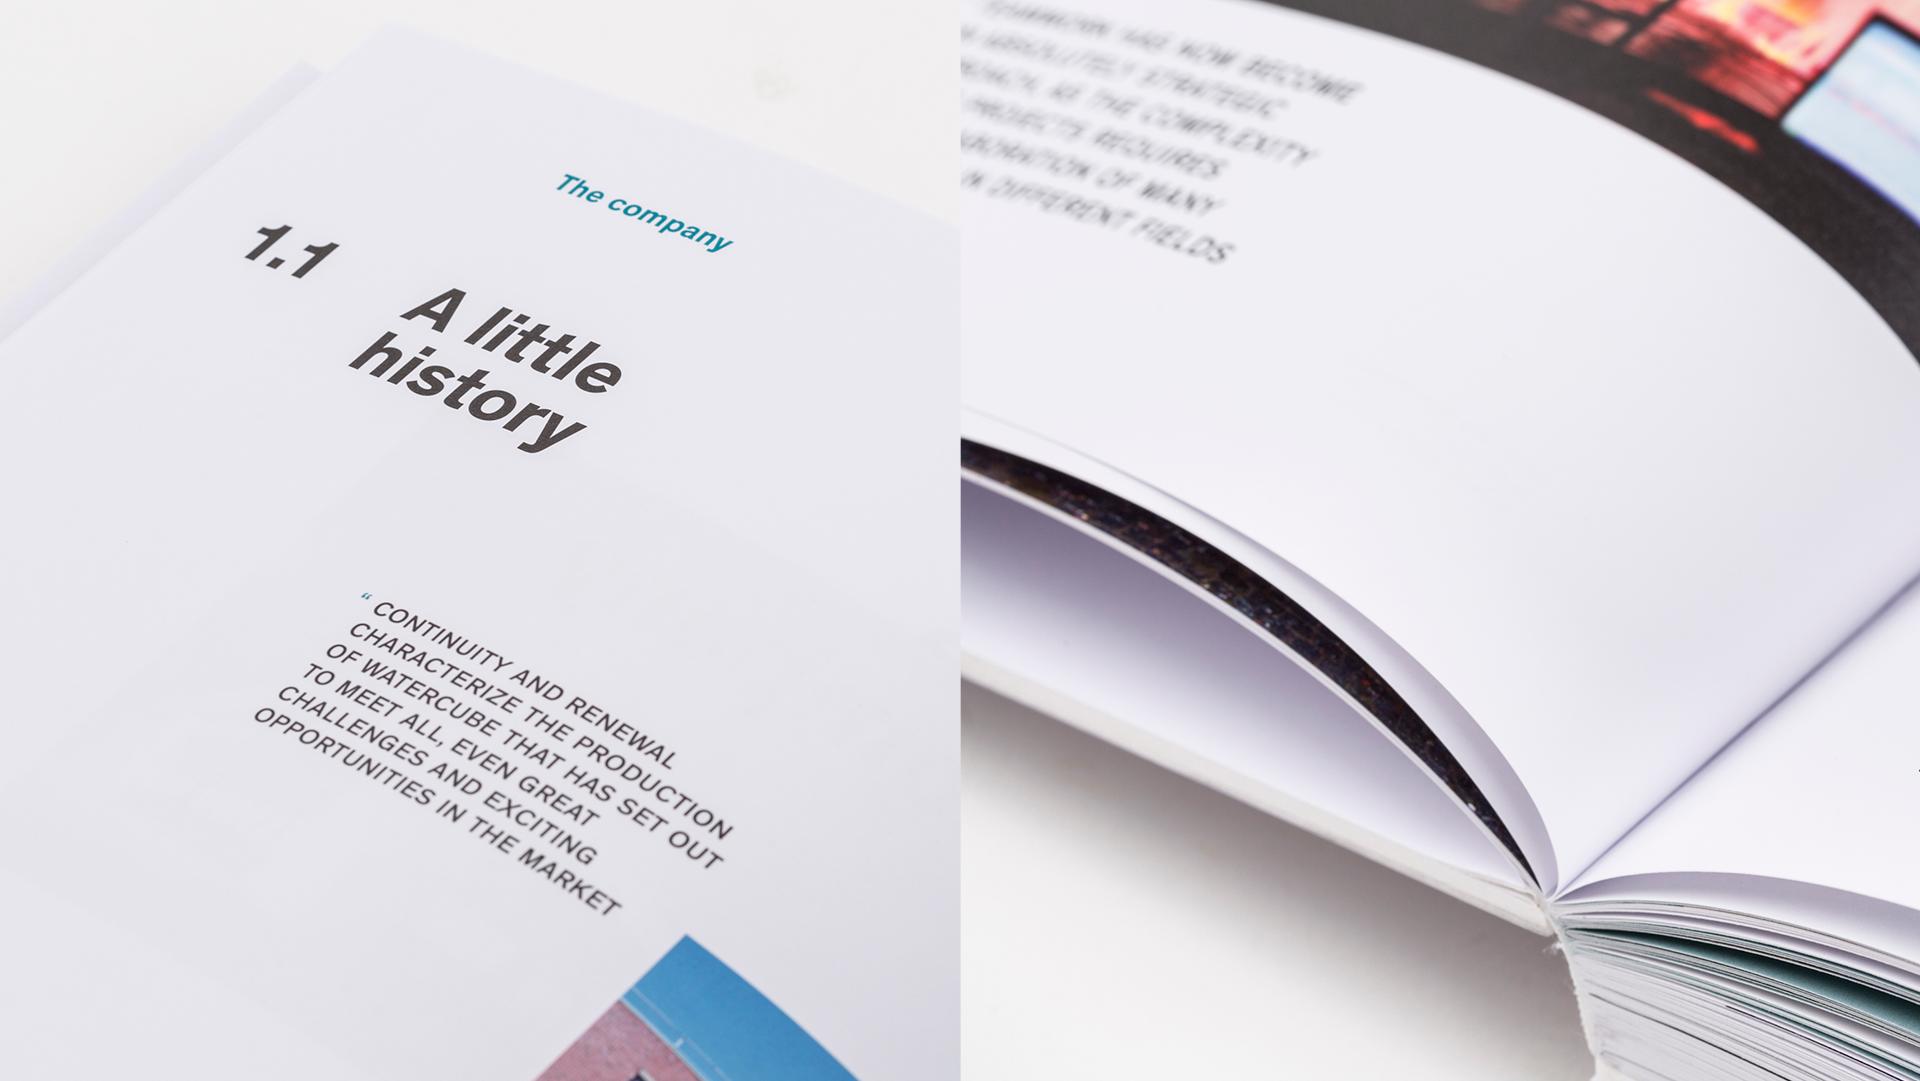 watercube book details